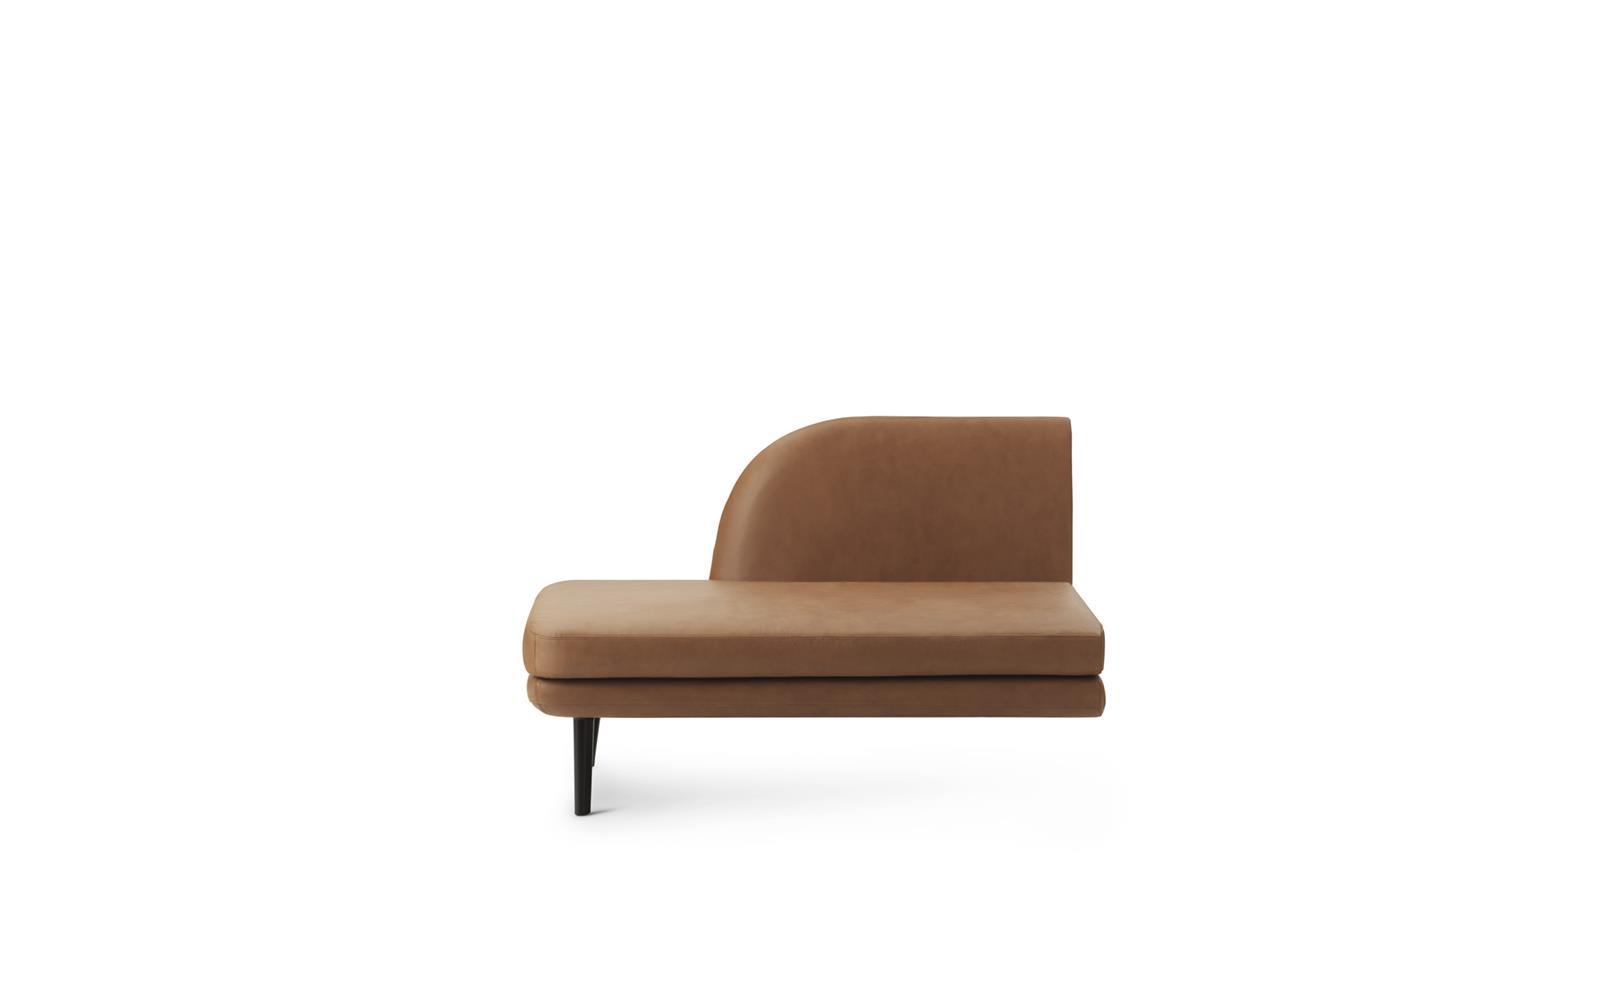 Sum Modular Sofa 330 Open Left Side, Black Aluminum, Ultra Leather